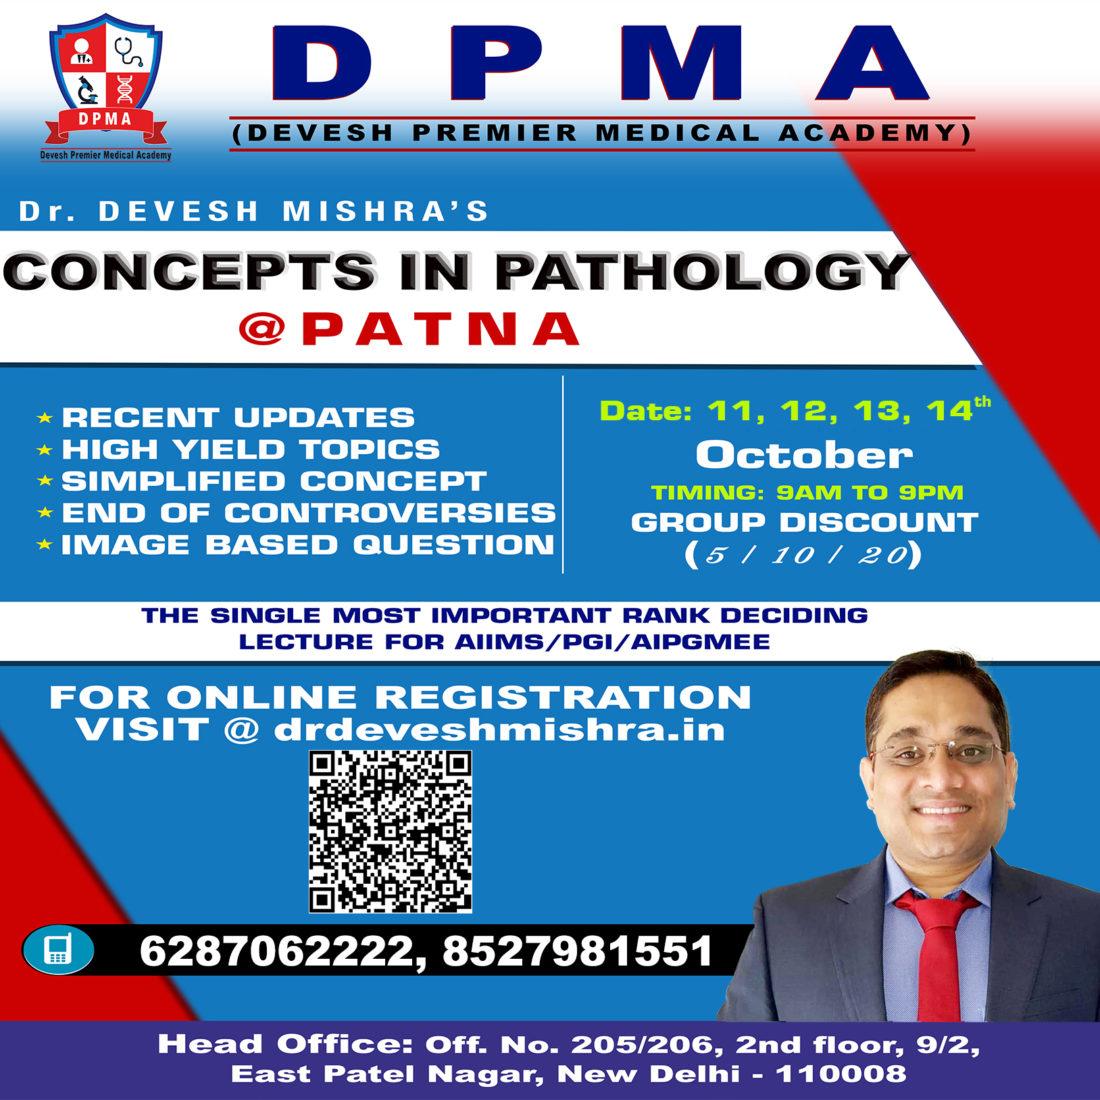 Patna website (3)